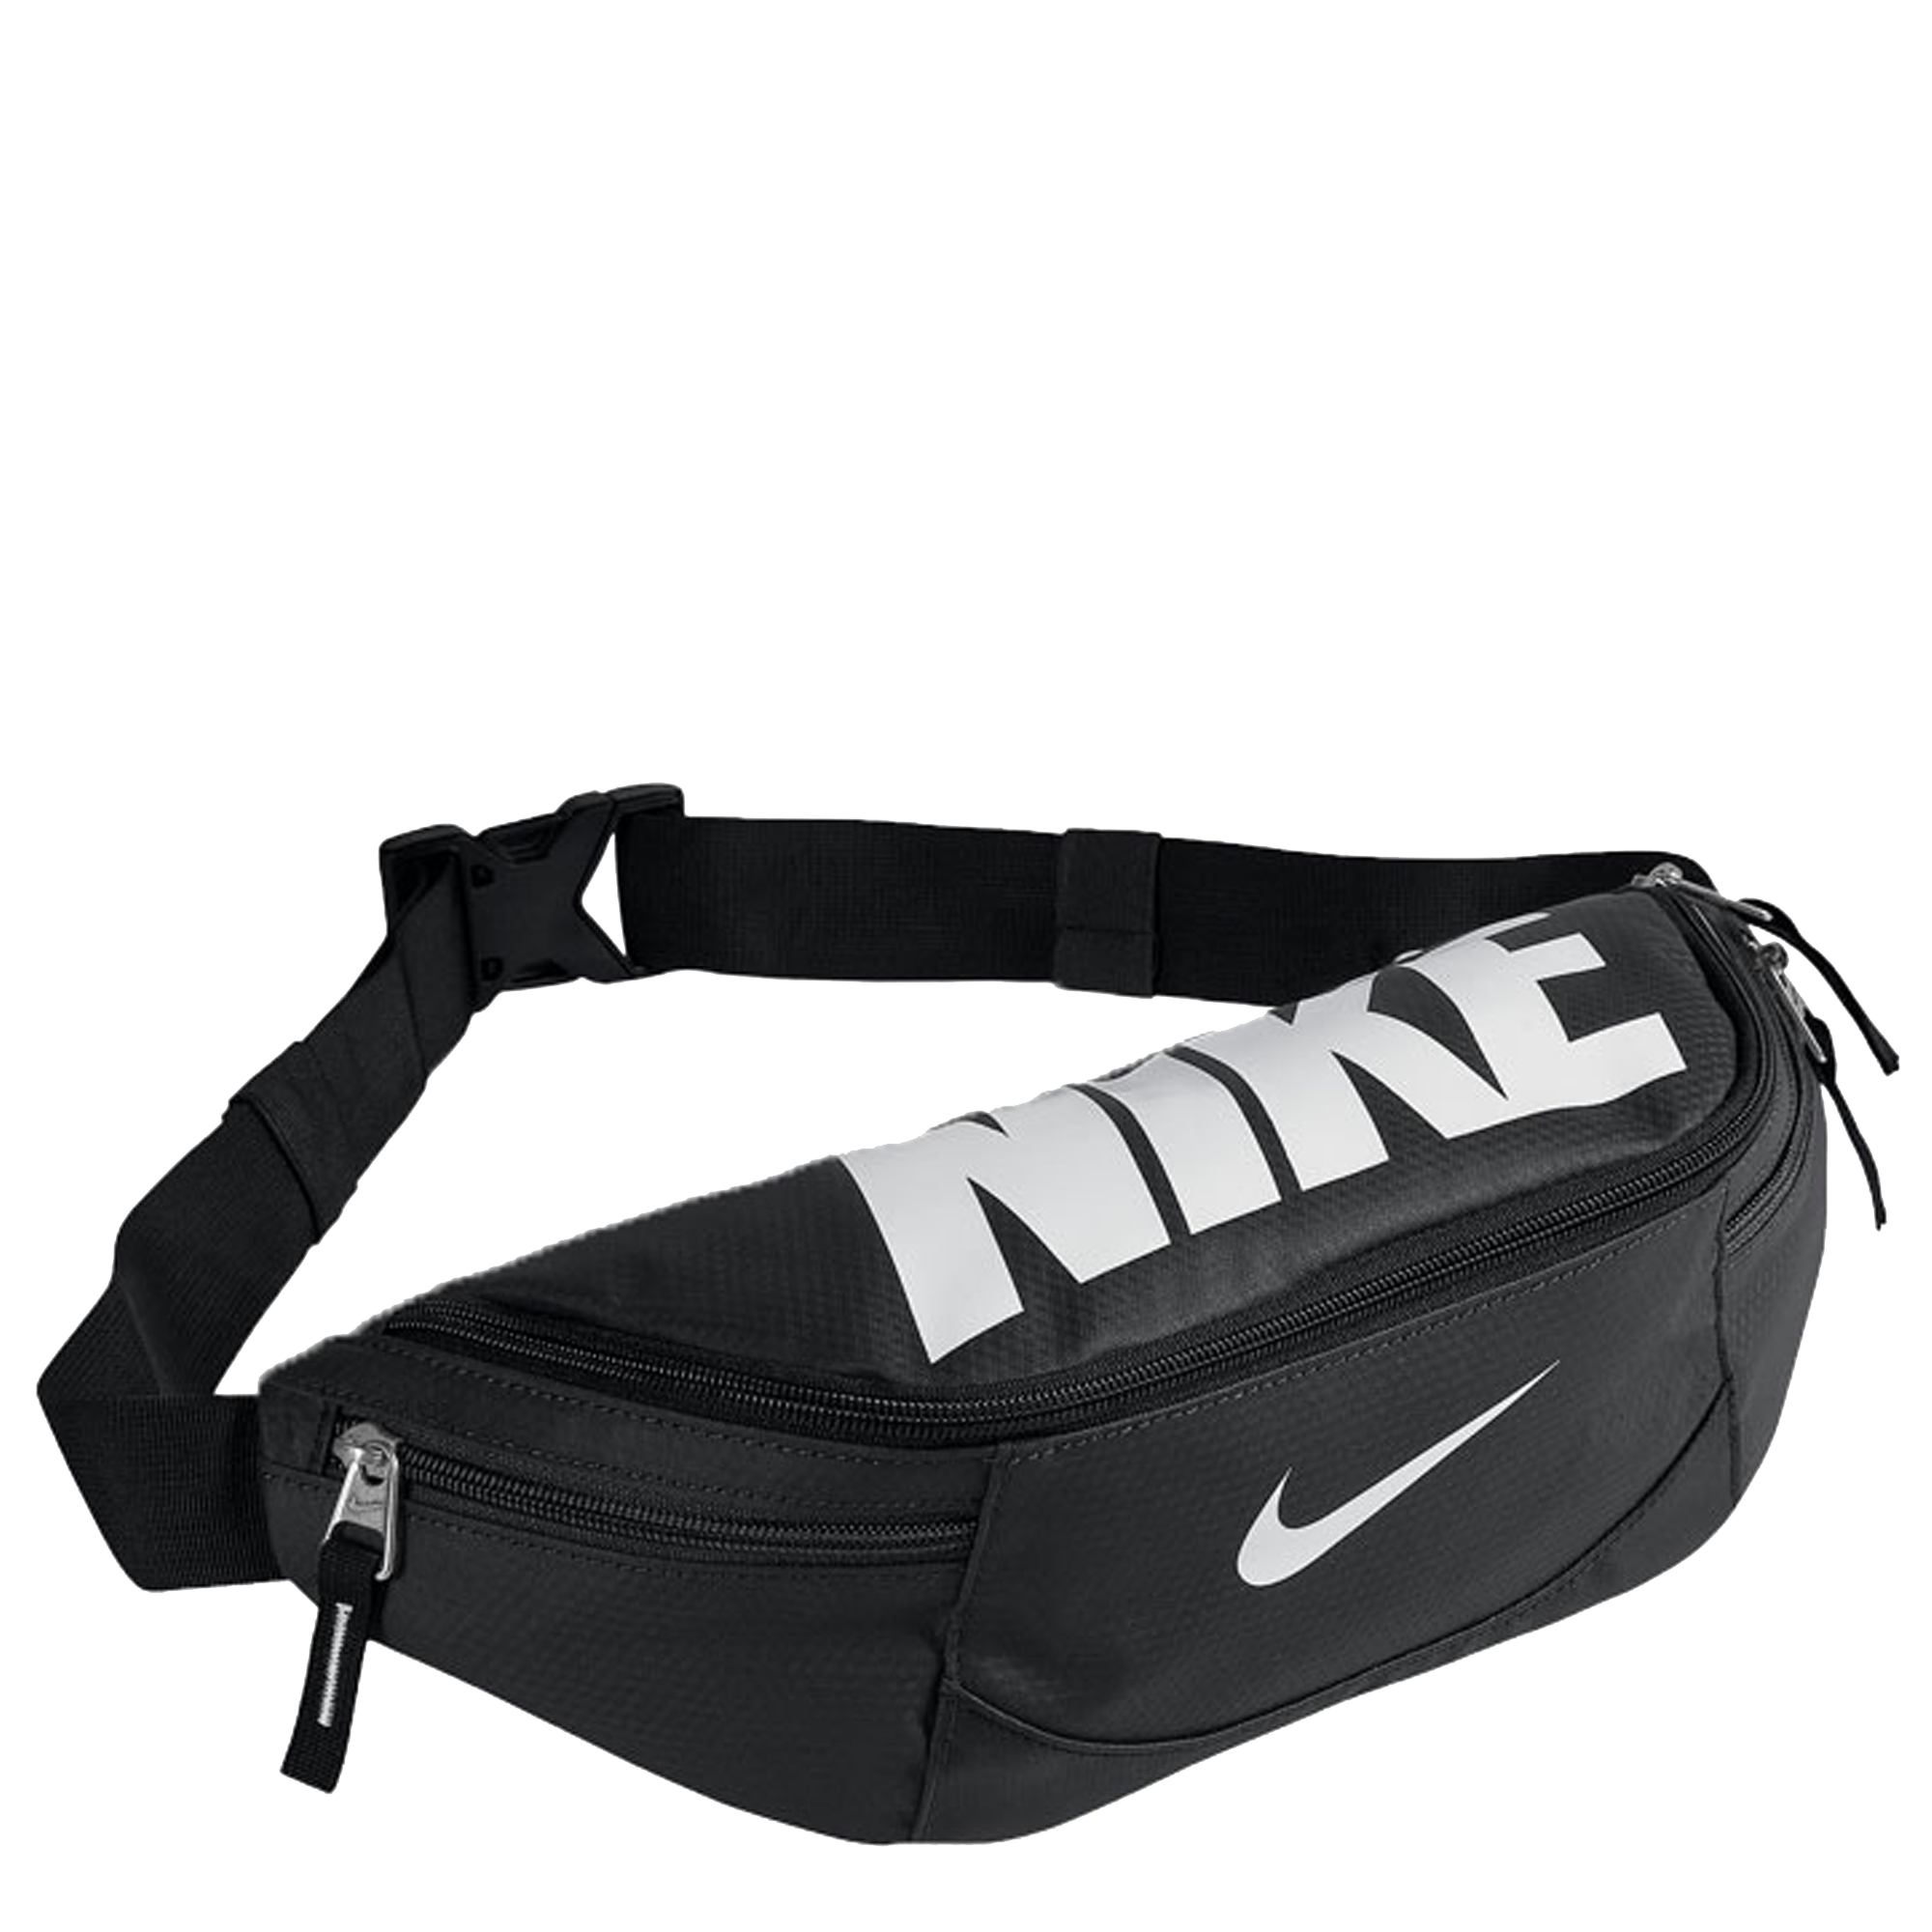 92ca1590ac1d9 Nike Team Training Waistpack CO Bel Çantası #BA4601-067 - Barcin.com